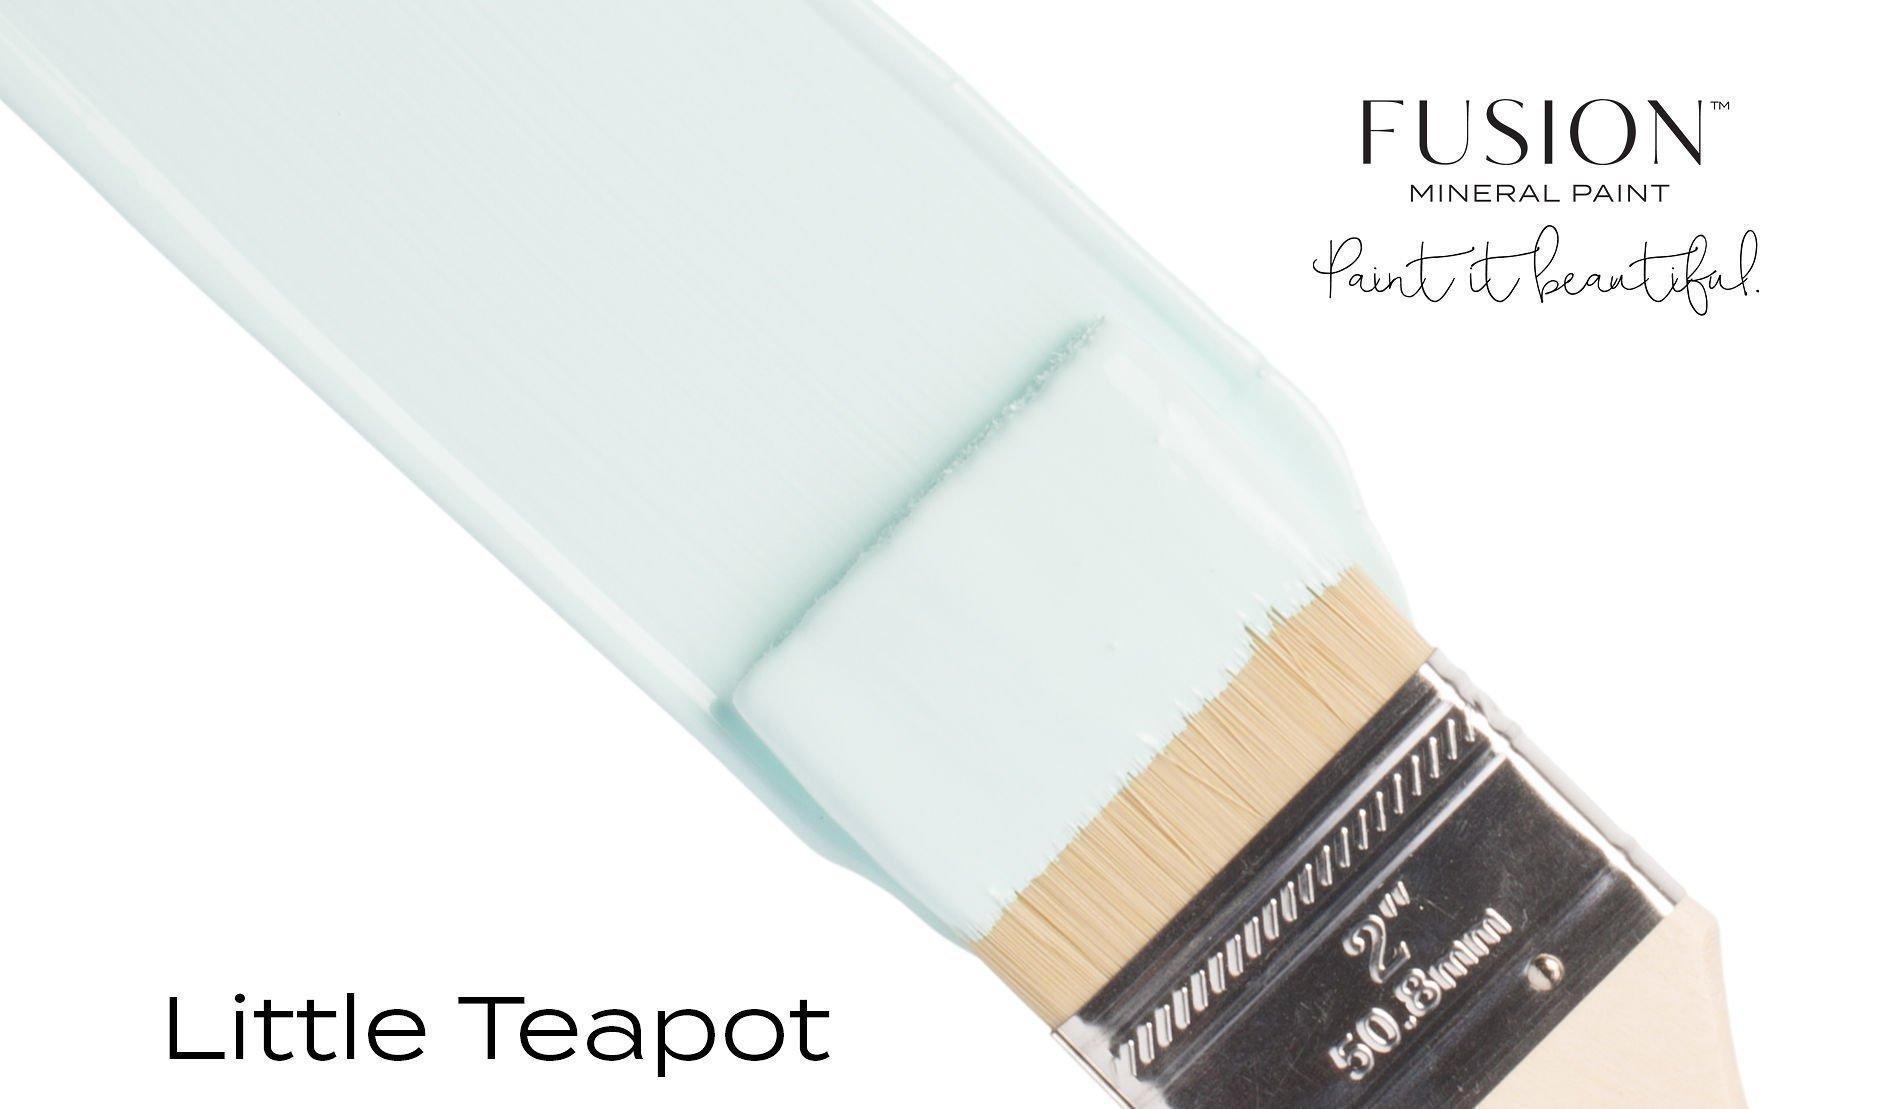 Fusion Mineral Paint Brushstroke - Little Teapot | www.raggedy-bits.com